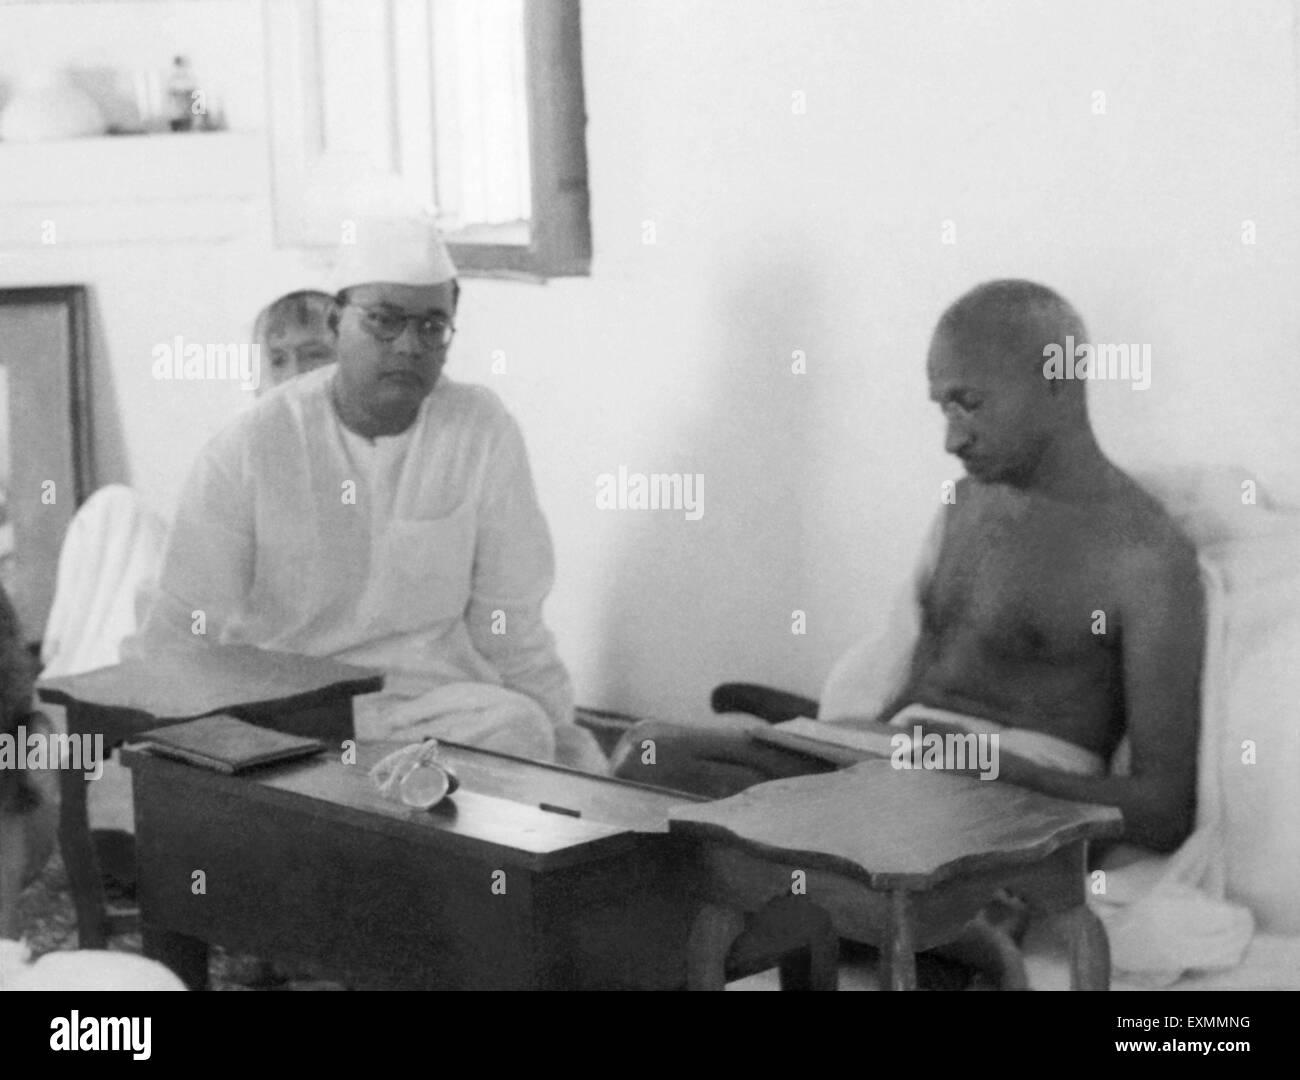 Subhash Chandra Bose and Mahatma Gandhi ; New Delhi ; 1938 ; India NO MR - Stock Image